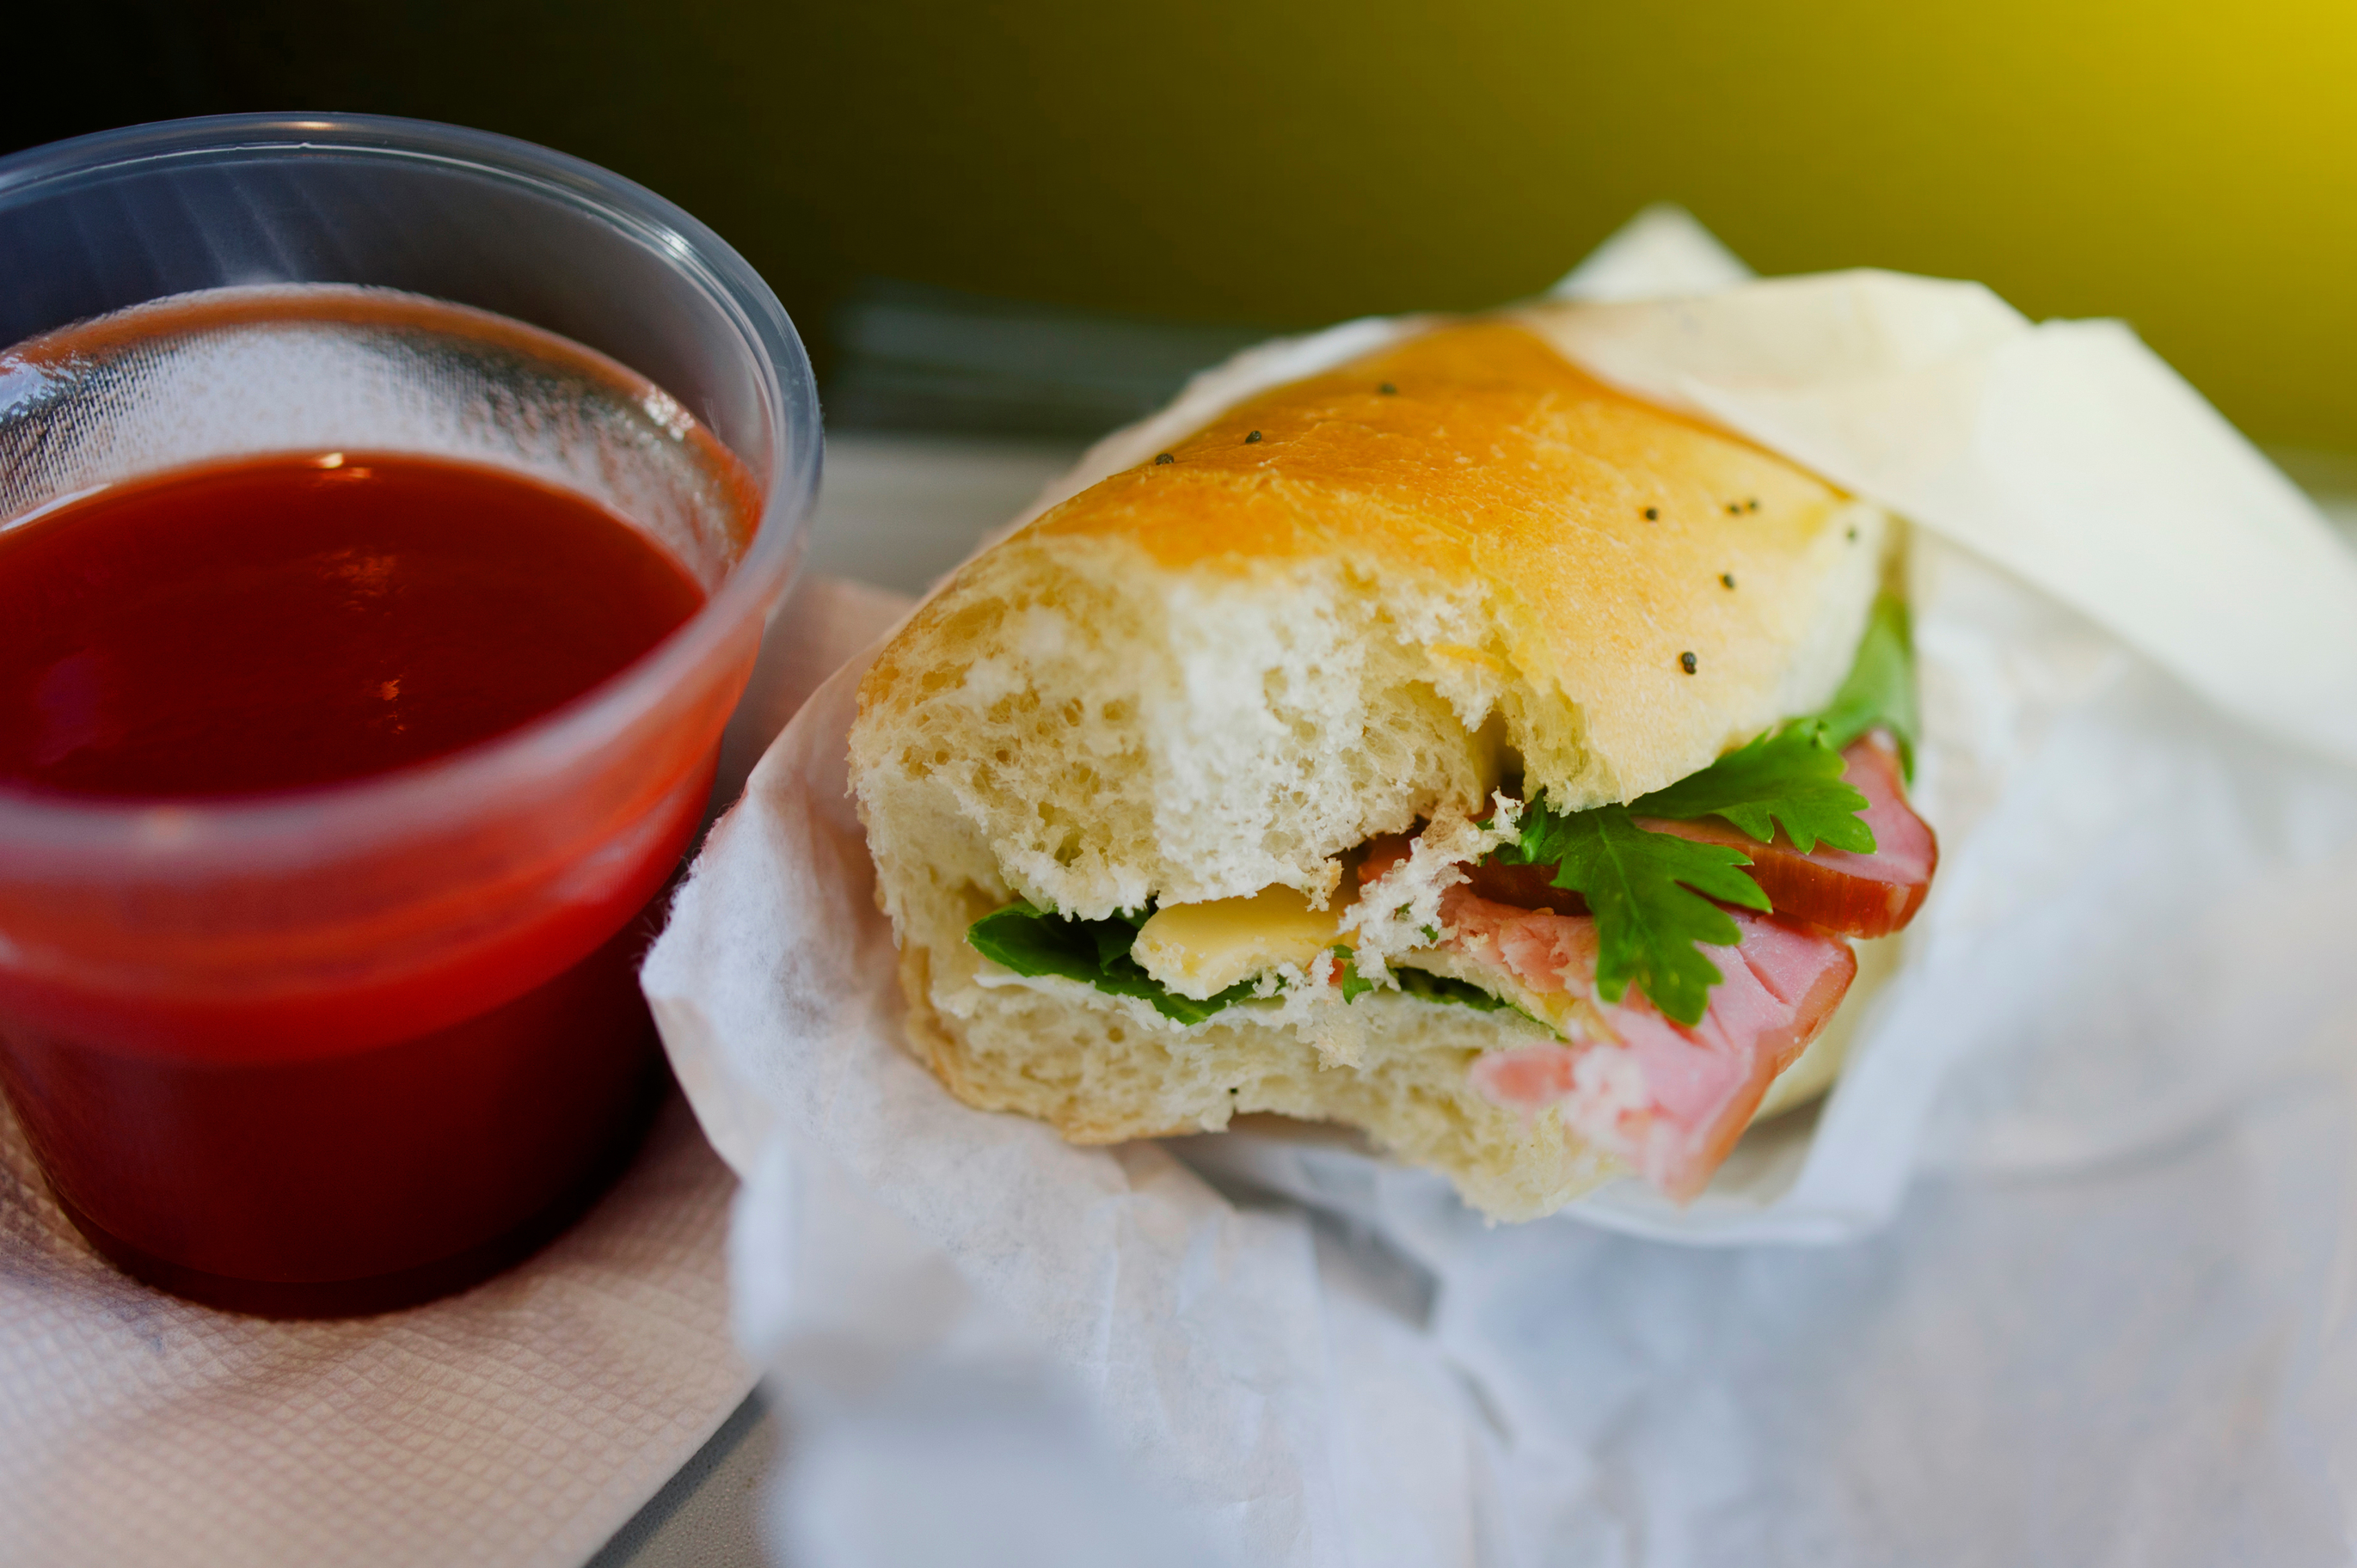 Tomato-Juice-Sandwich-Airplane-Tray.jpg?mtime=20180710113433#asset:102424